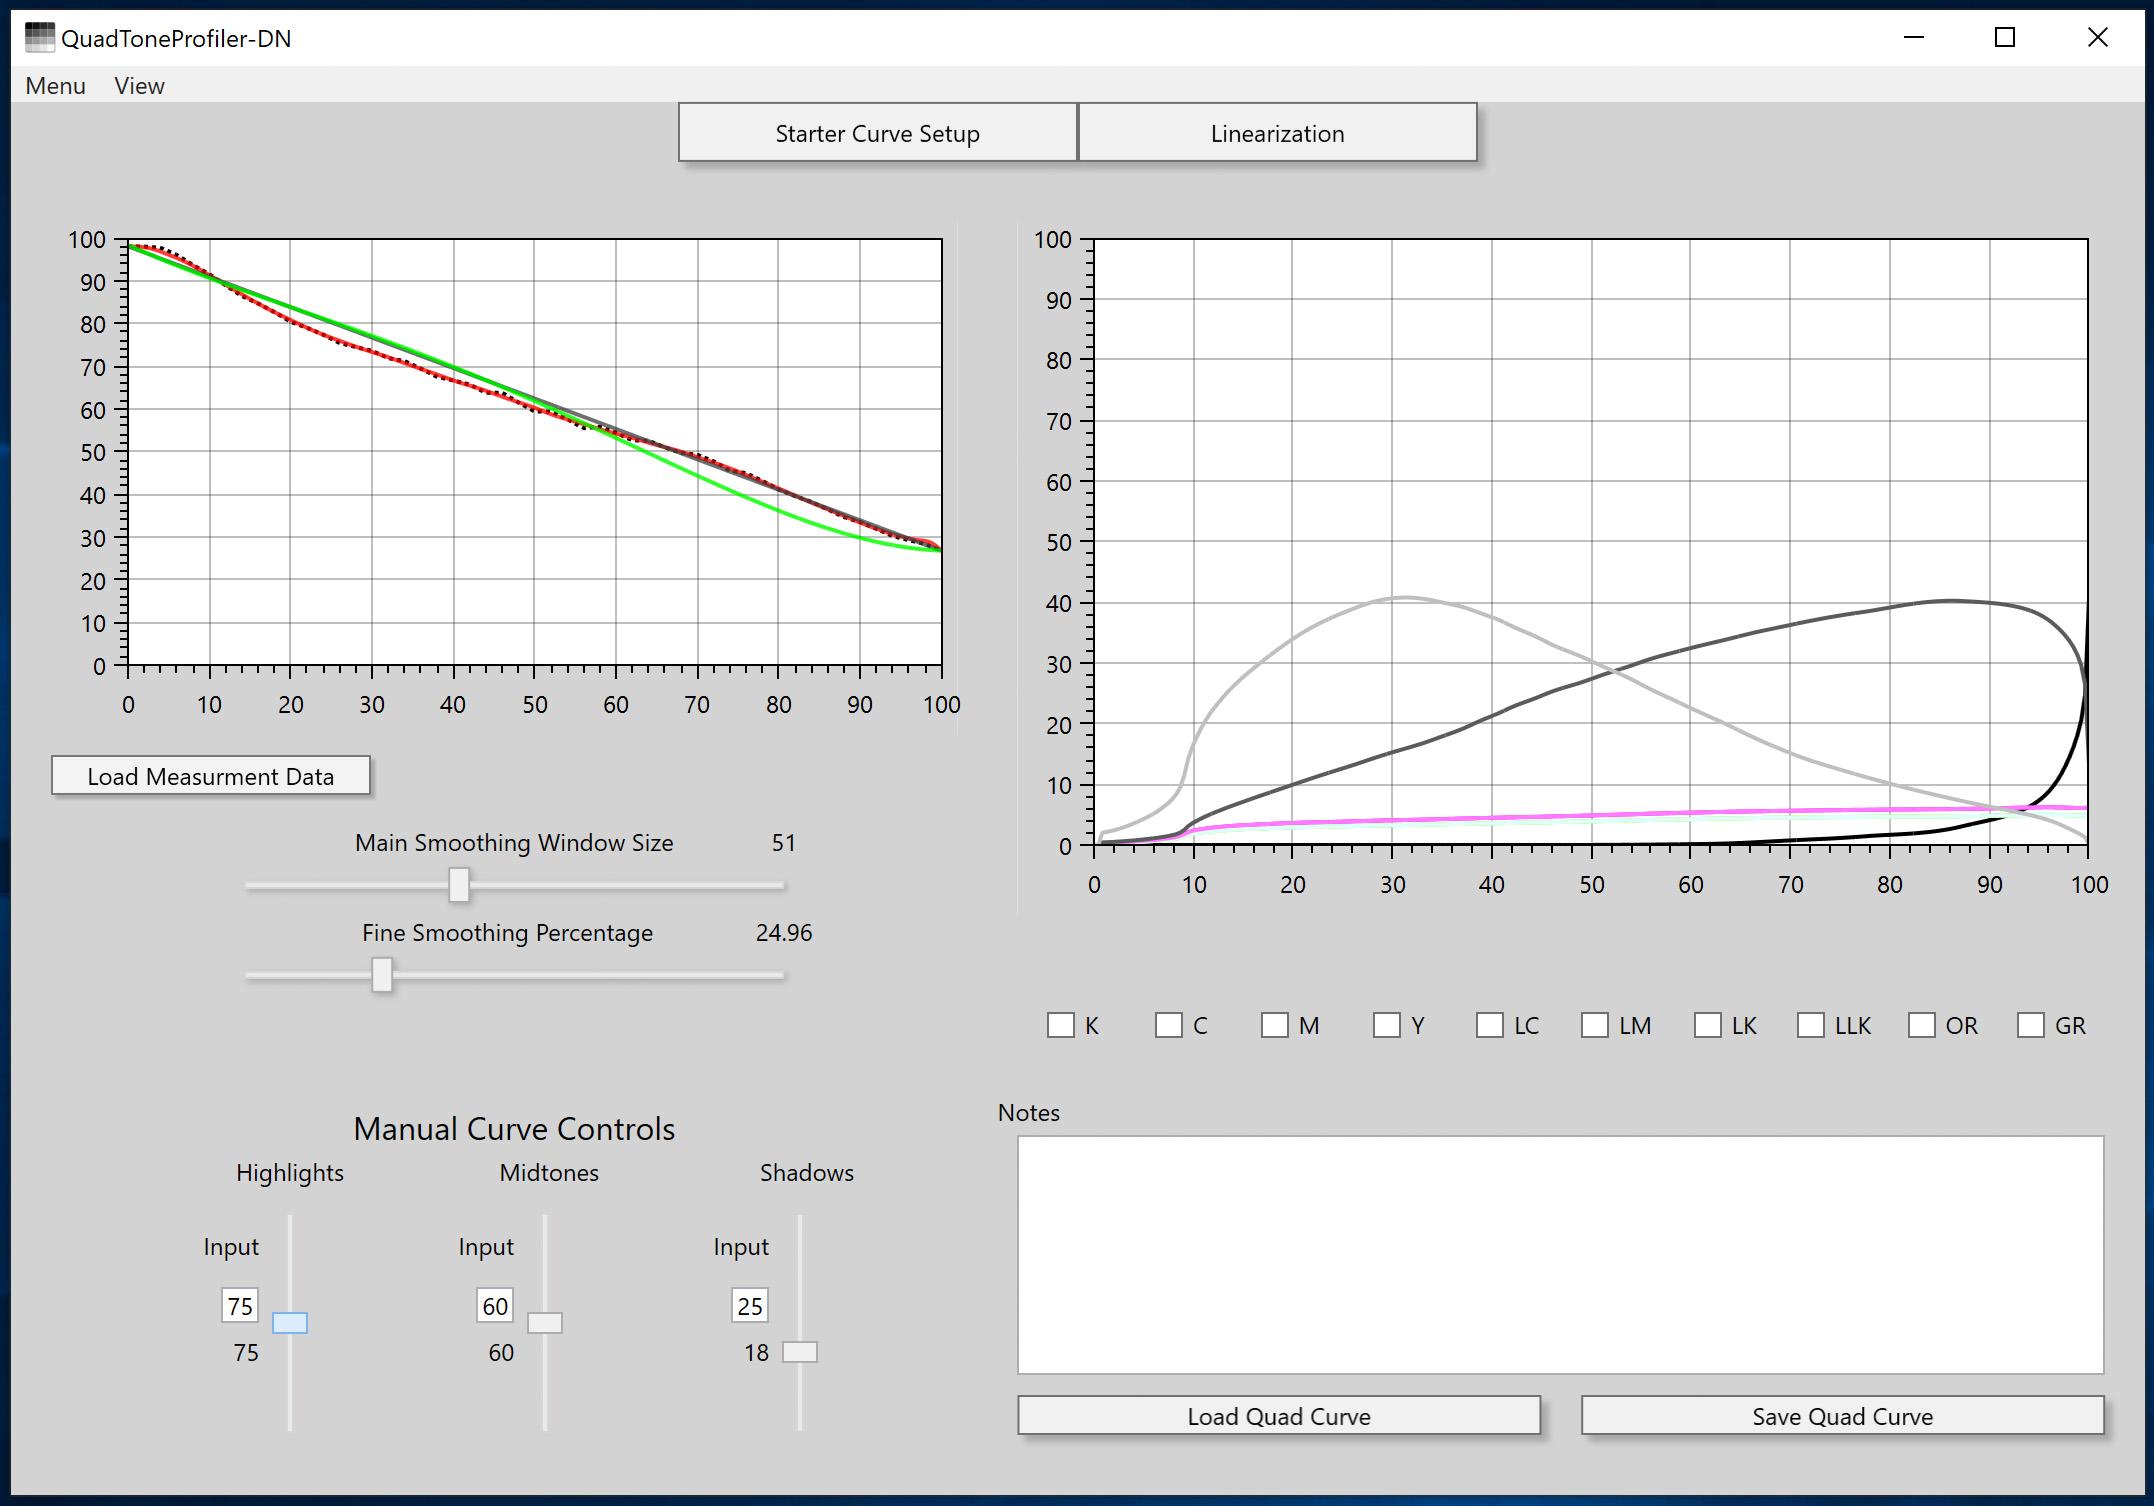 QuadToneProfiler-QuickCurve-DN for Windows Linearization Screen.jpg